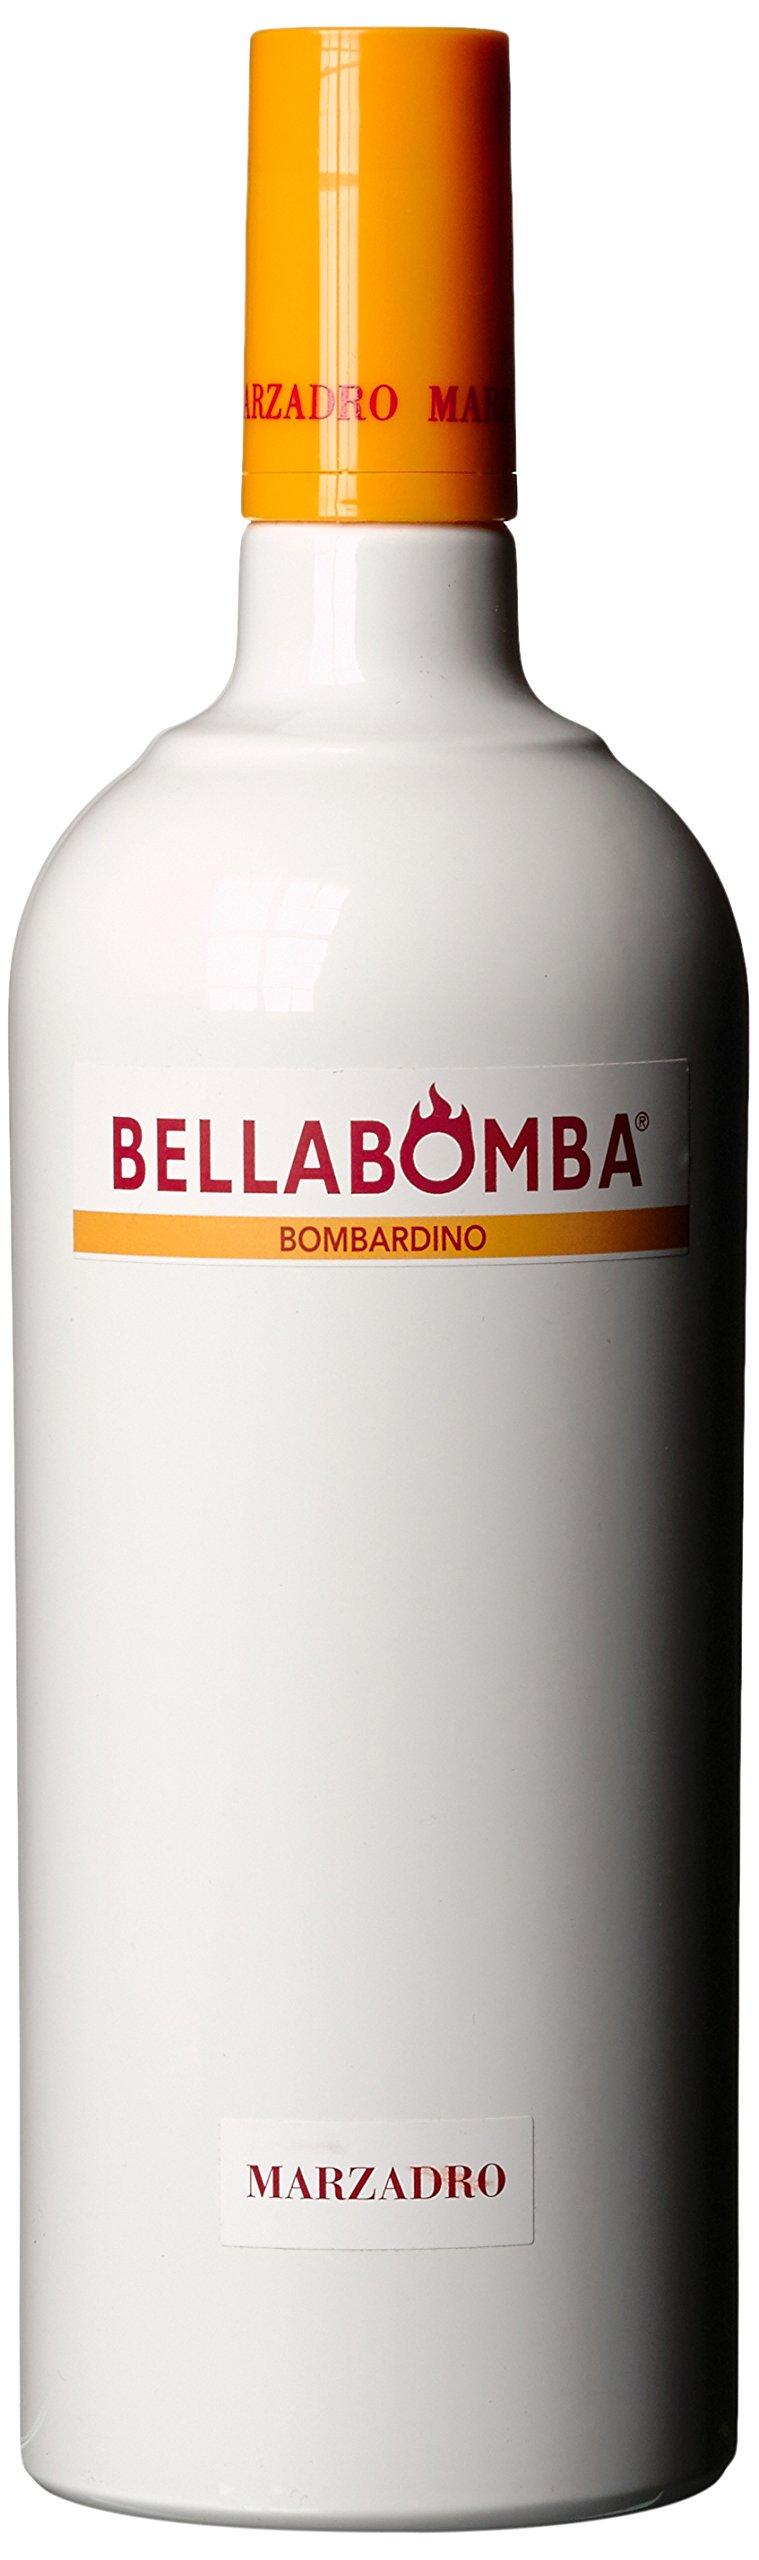 Marzadro-Bellabomba-Likre-1-x-1-l